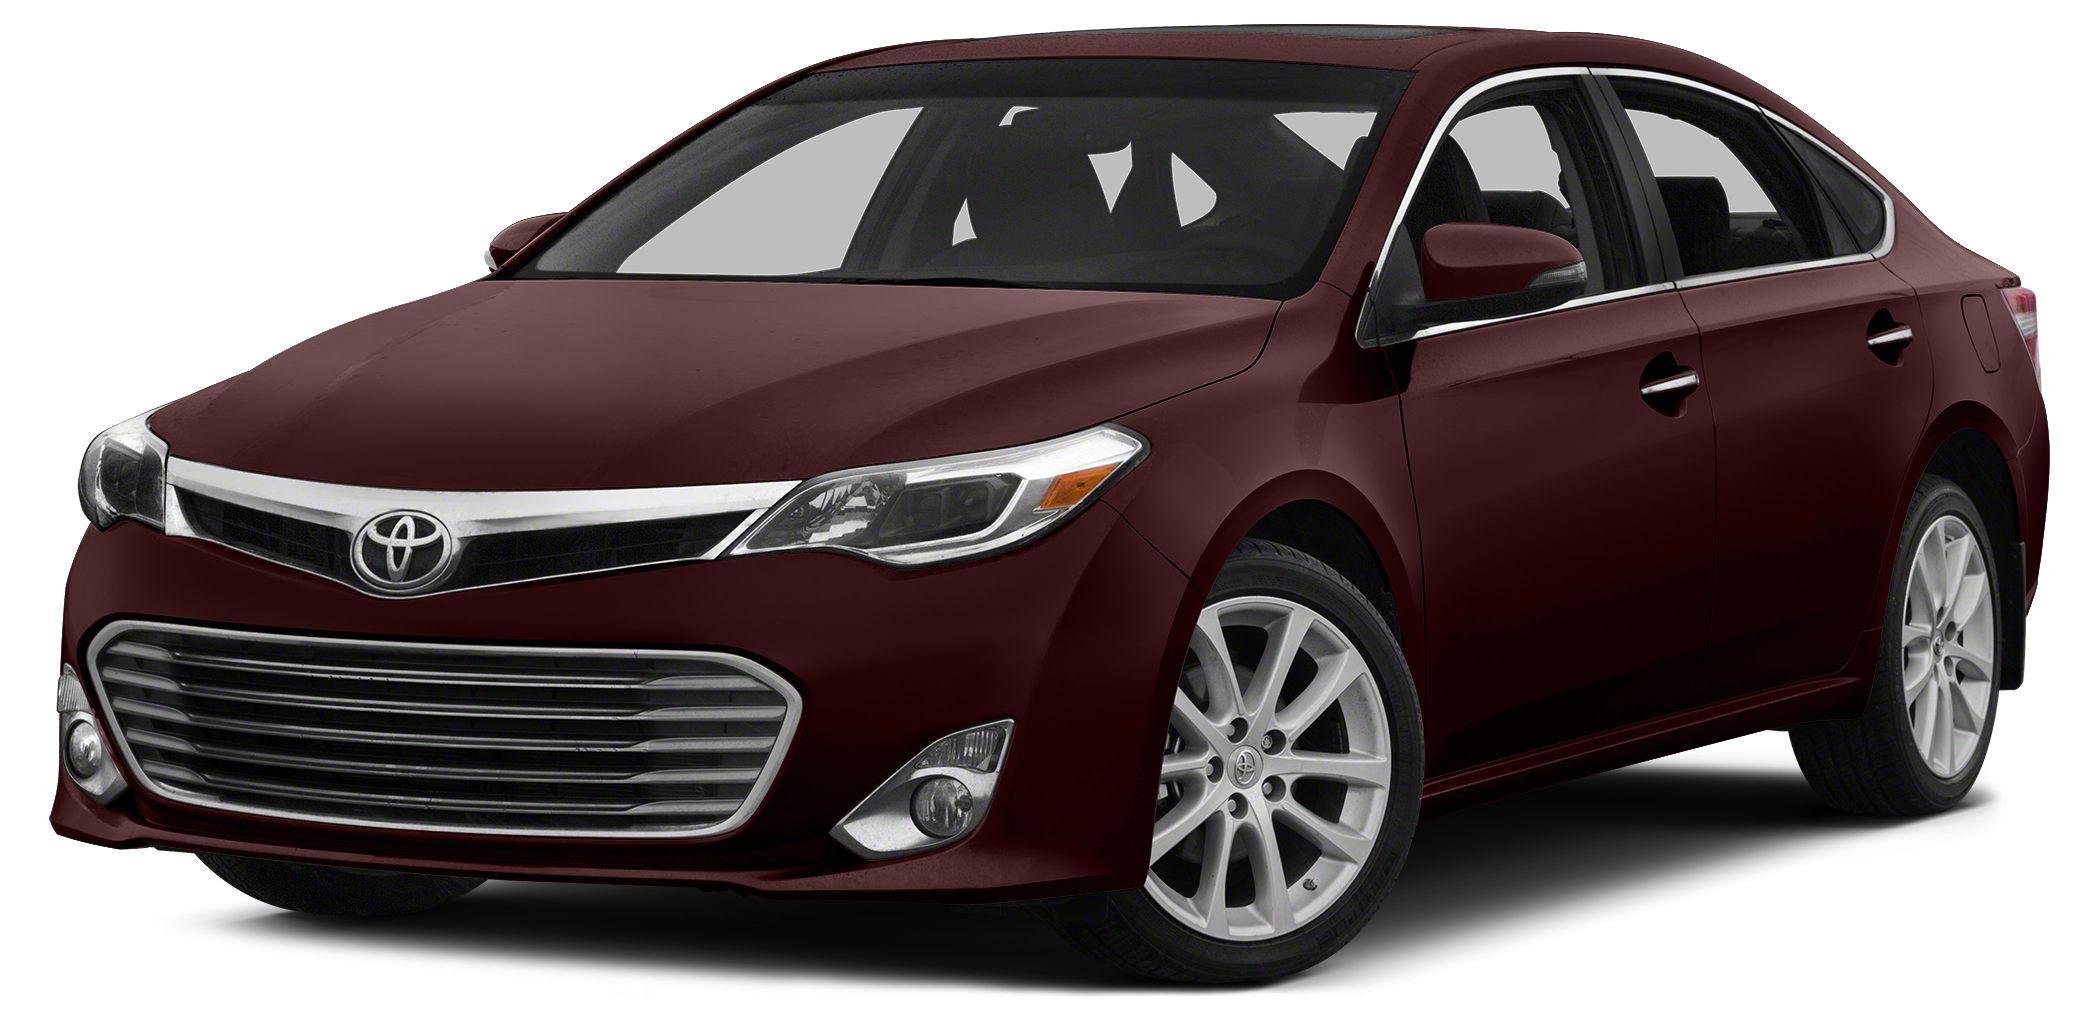 2013 Toyota Avalon Limited CARFAX 1-Owner Limited trim Sunroof Navigation HeatedCooled Leathe